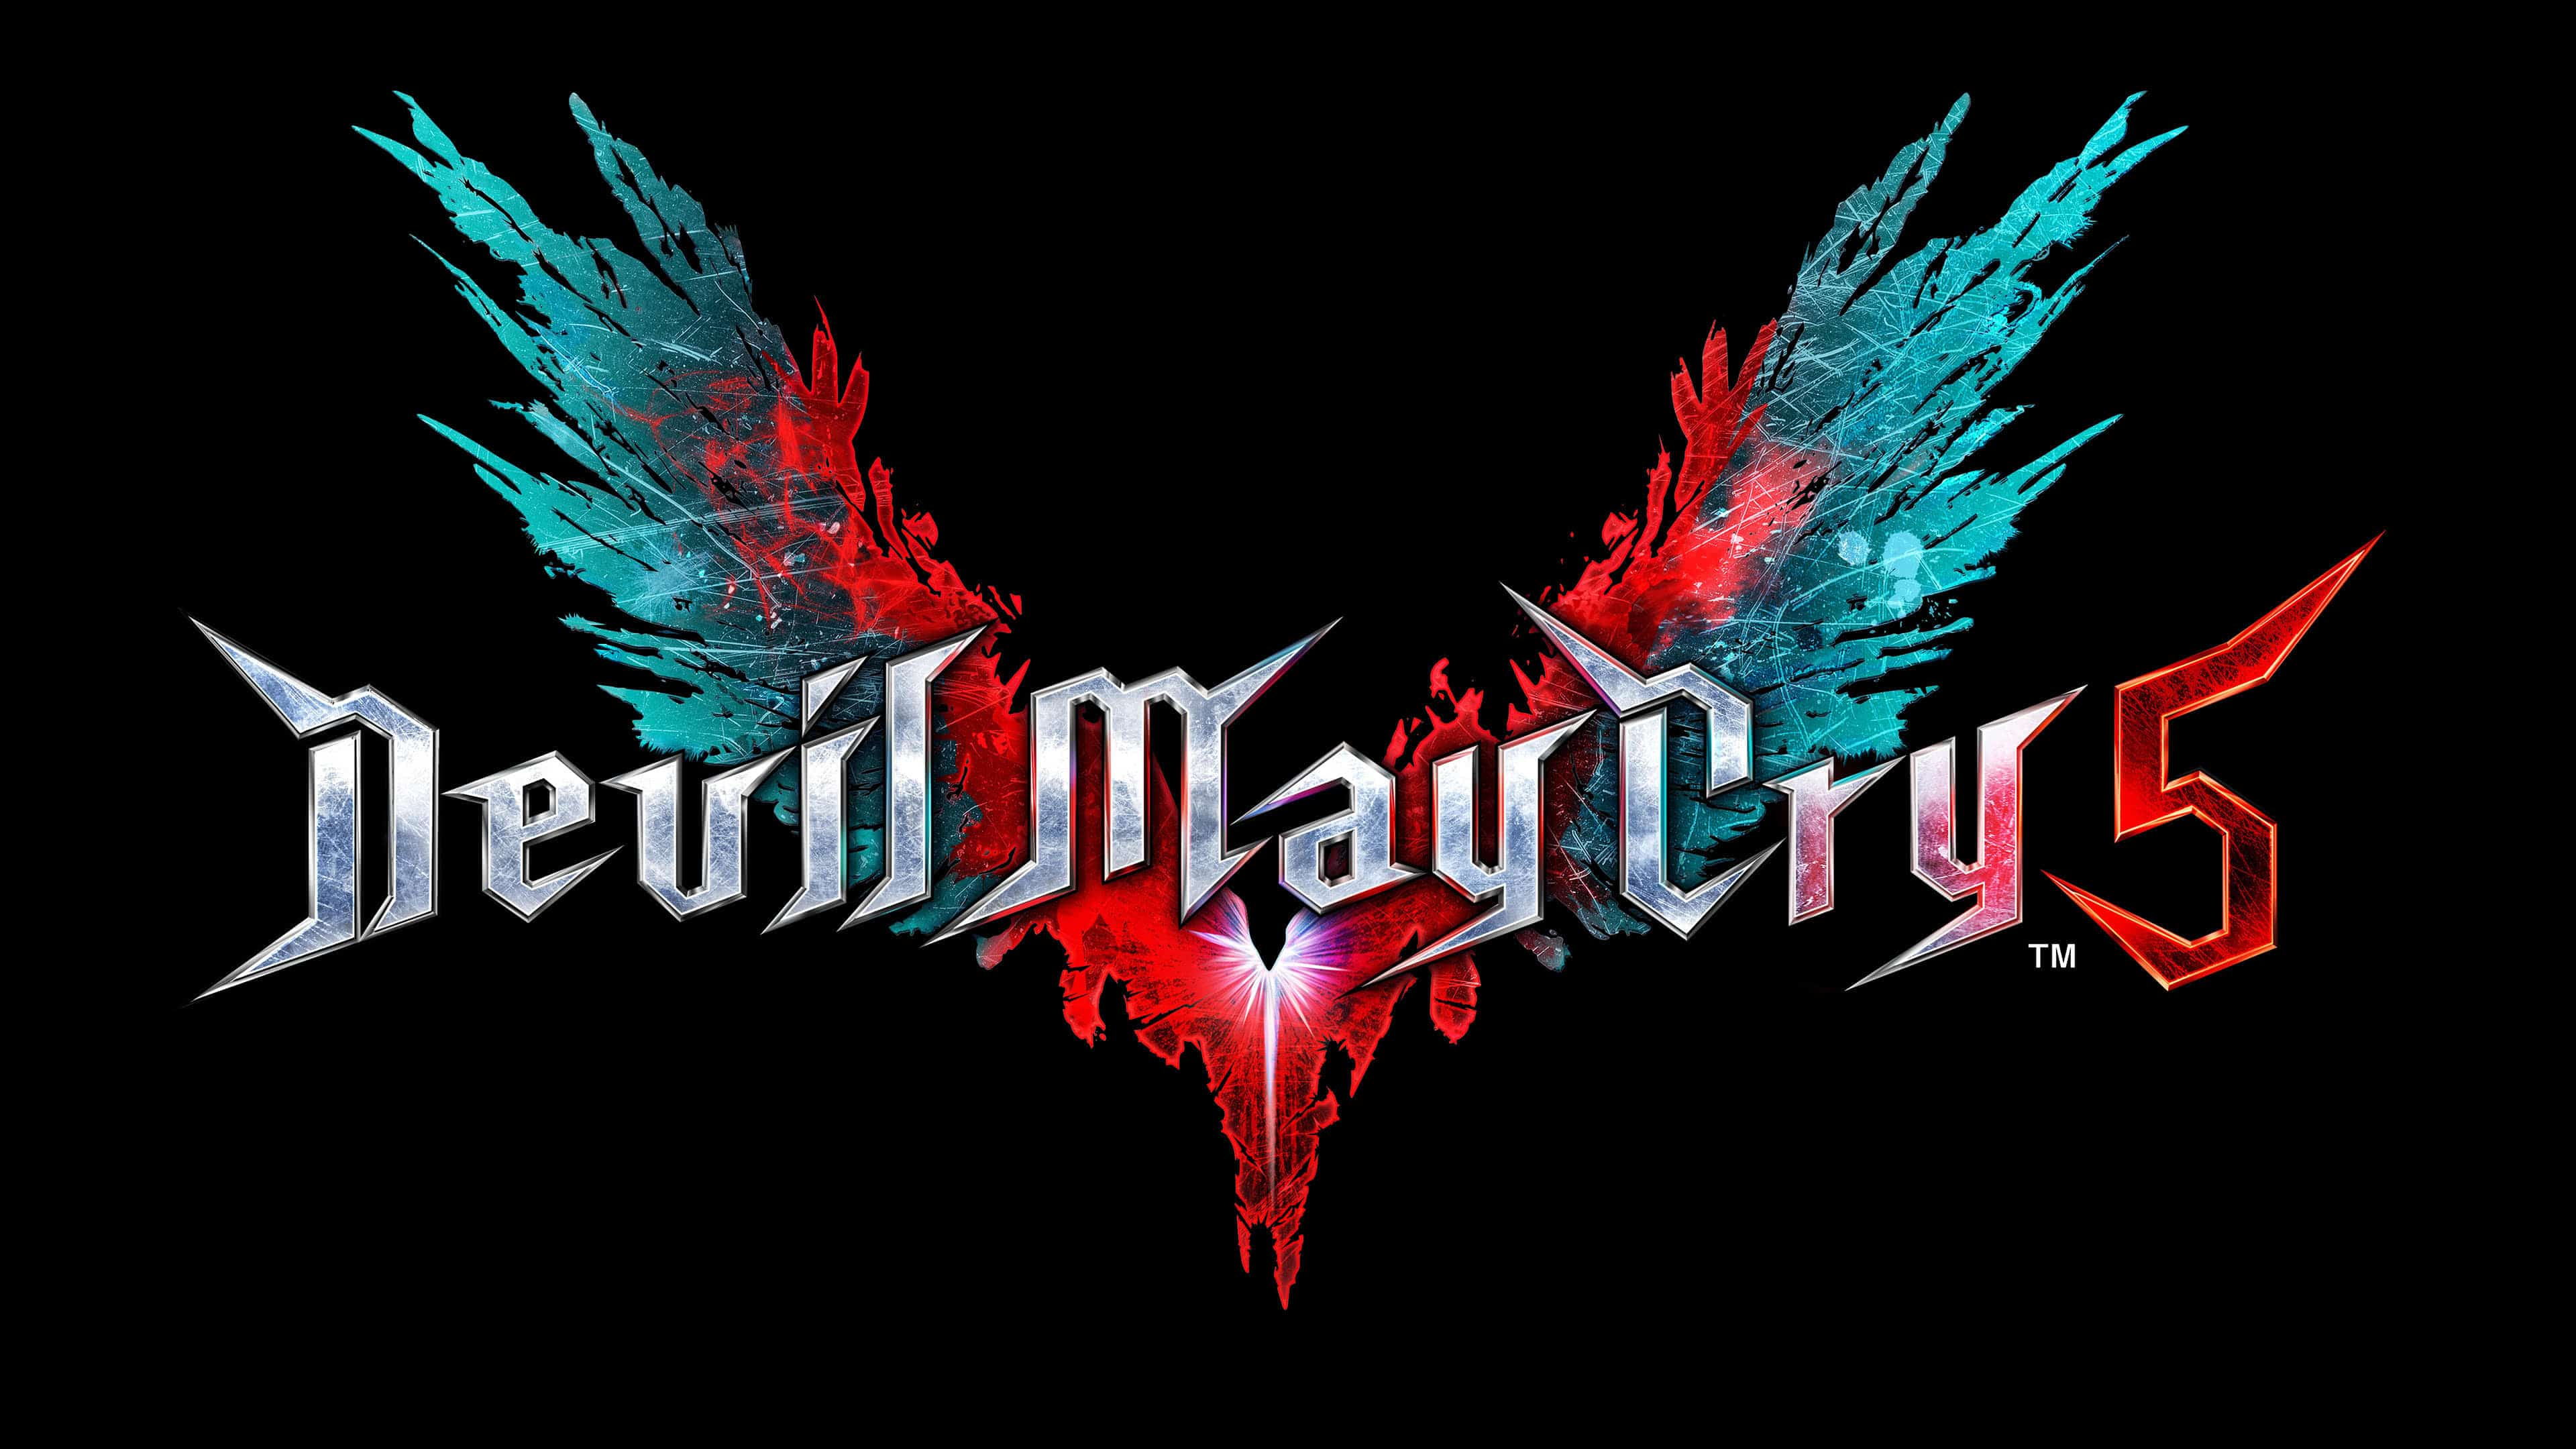 Devil May Cry 5 Logo Uhd 4k Wallpaper Pixelz